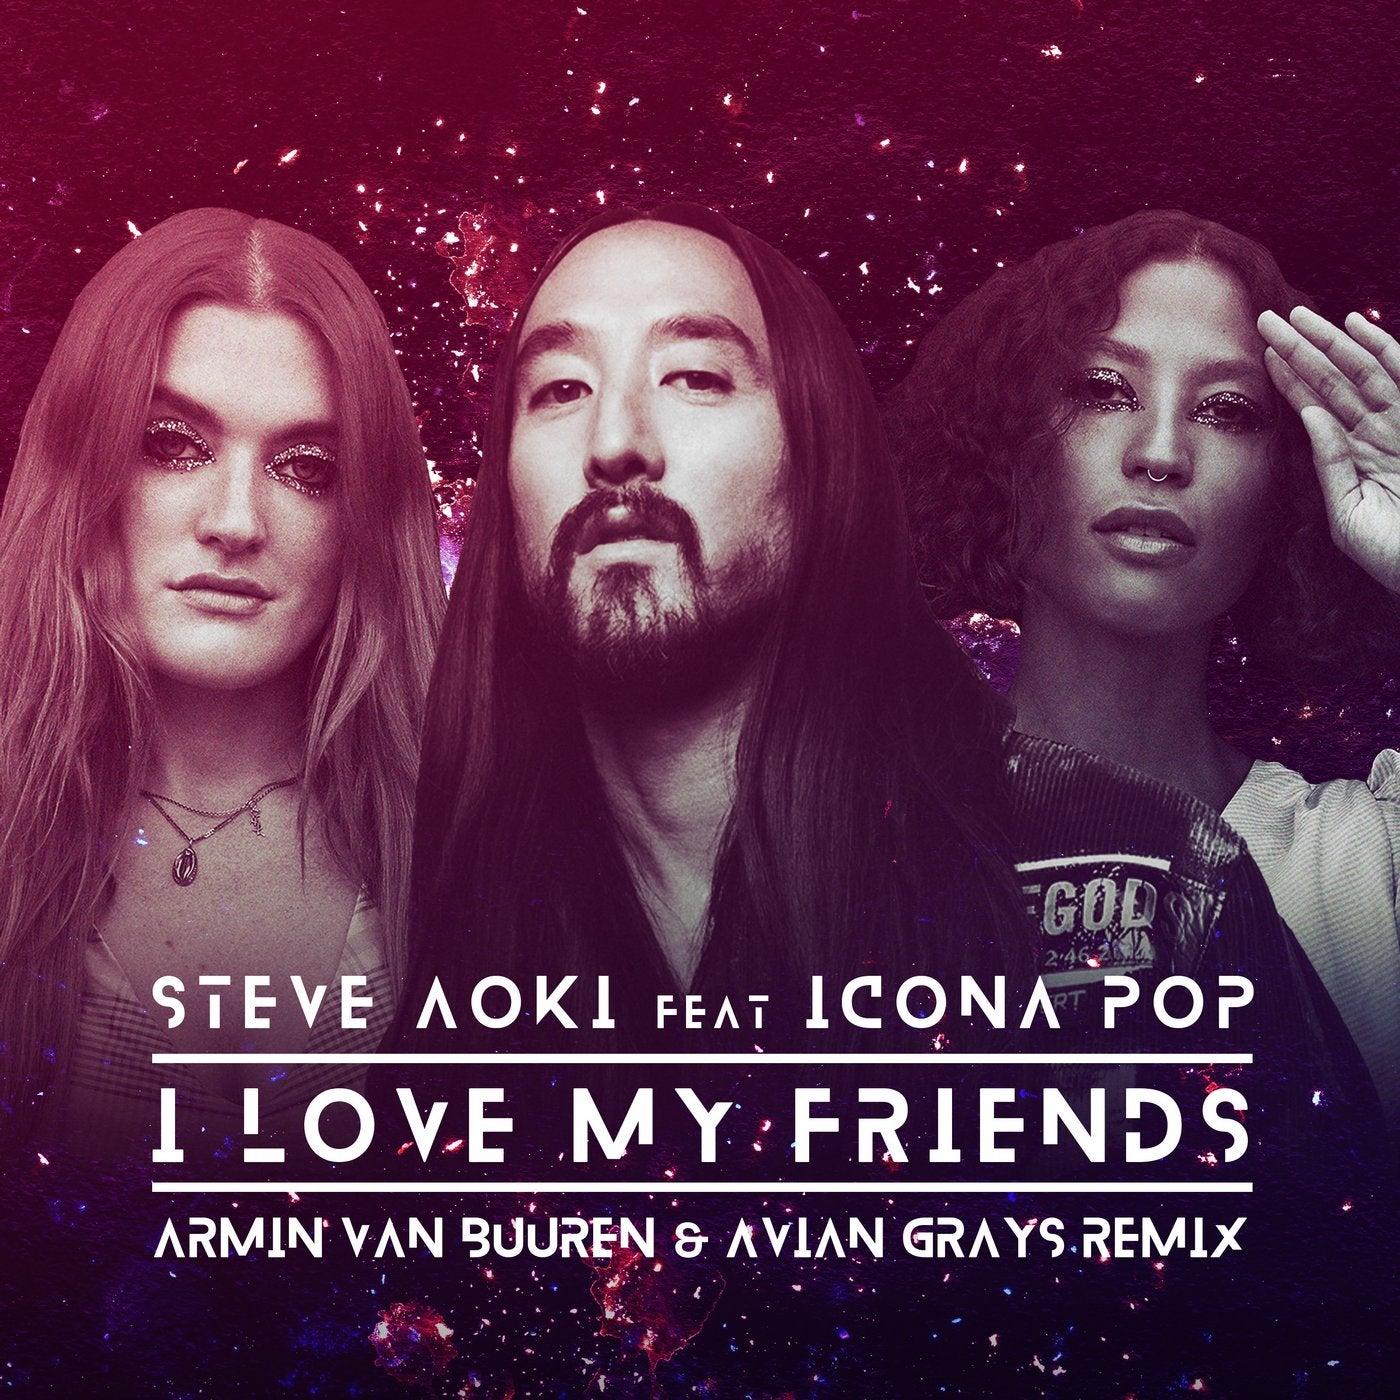 I Love My Friends feat. Icona Pop (Armin van Buuren & Avian Grays Extended Mix)